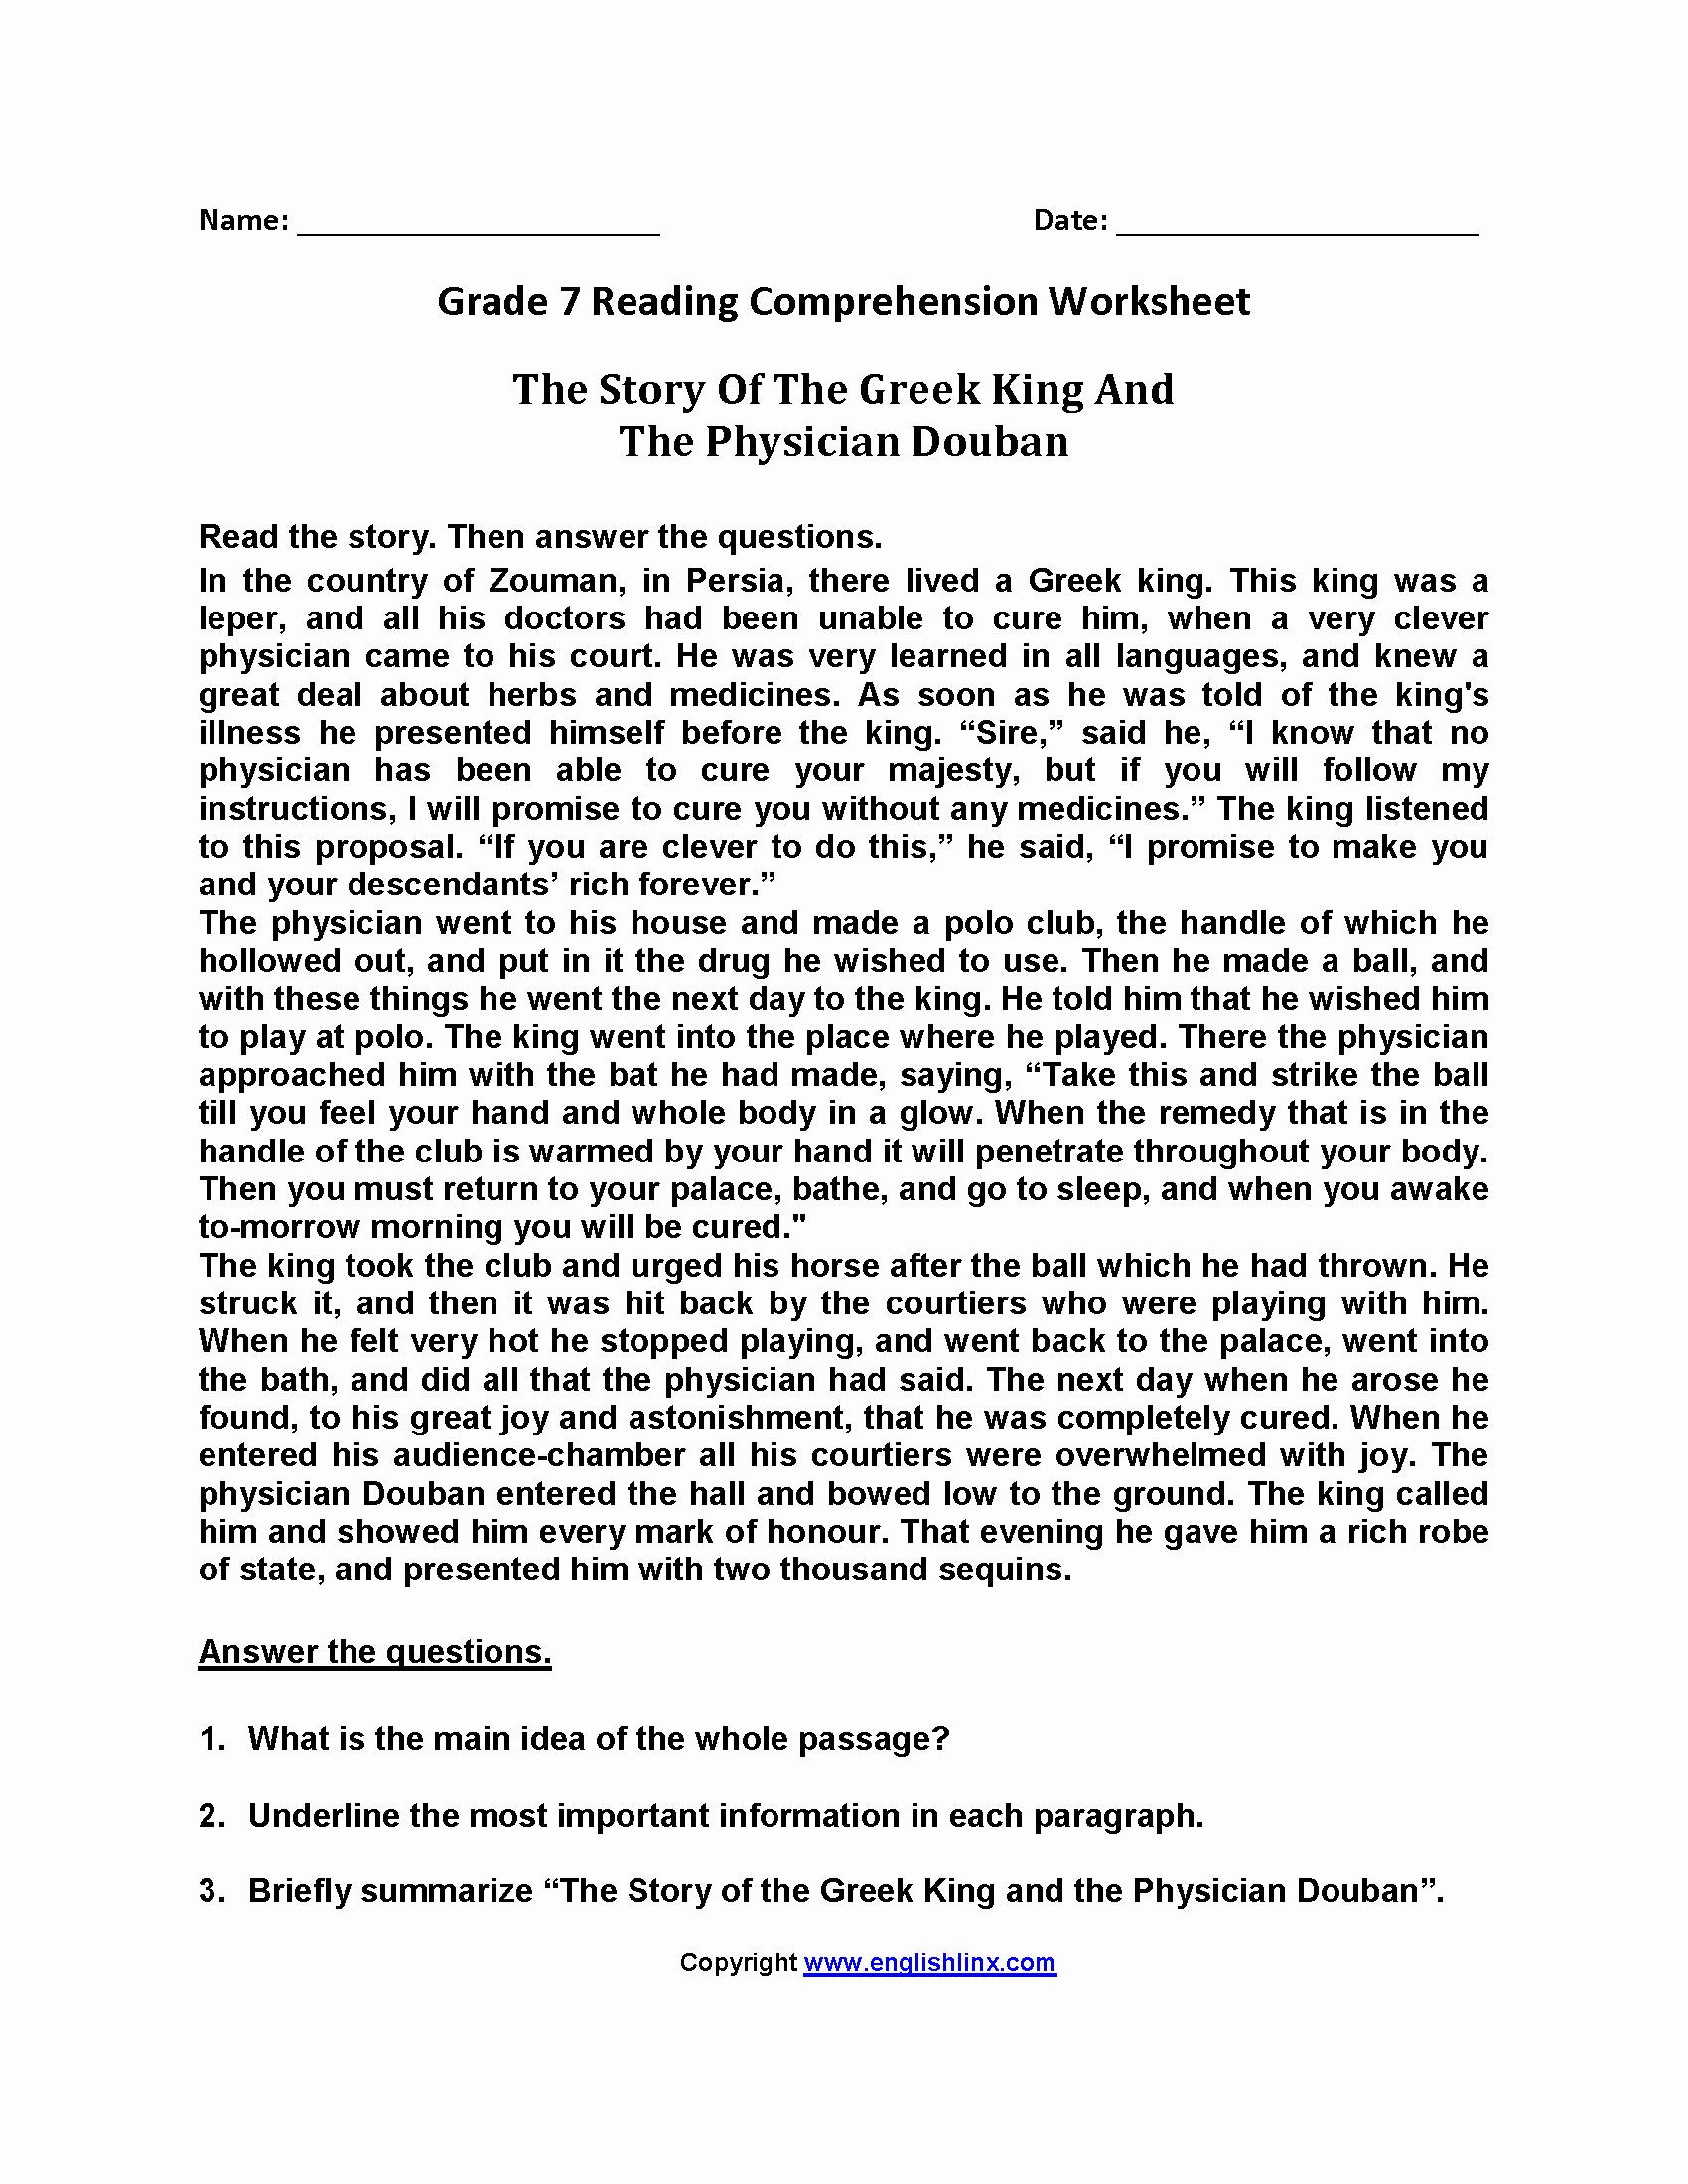 Free 7th Grade Reading Worksheets Beautiful 7th Grade English Reading Worksheets Tutorial Worksheet